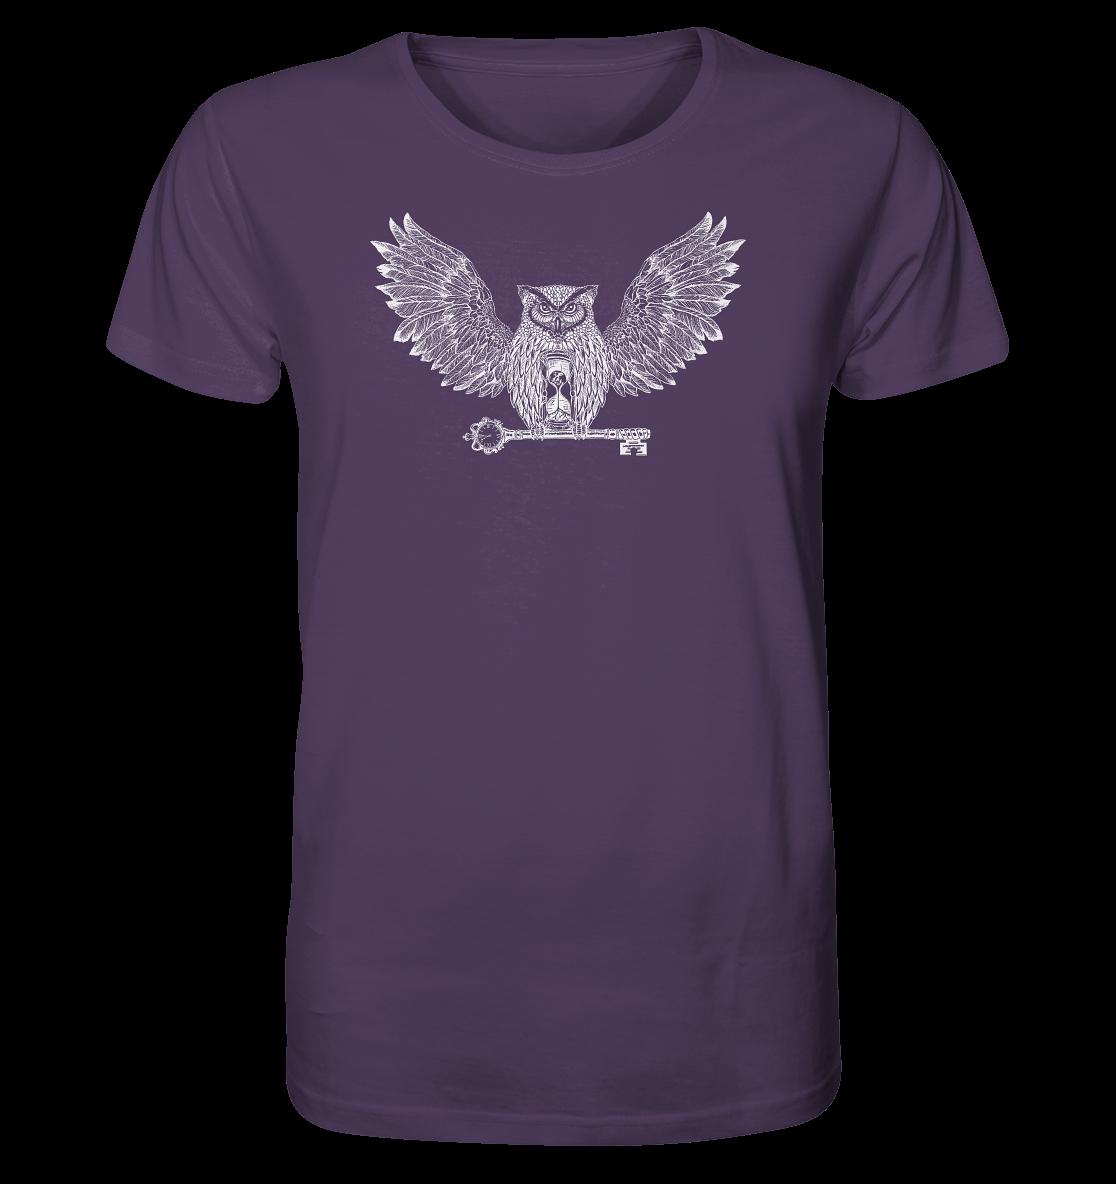 front-organic-shirt-523f5f-1116x-4.png